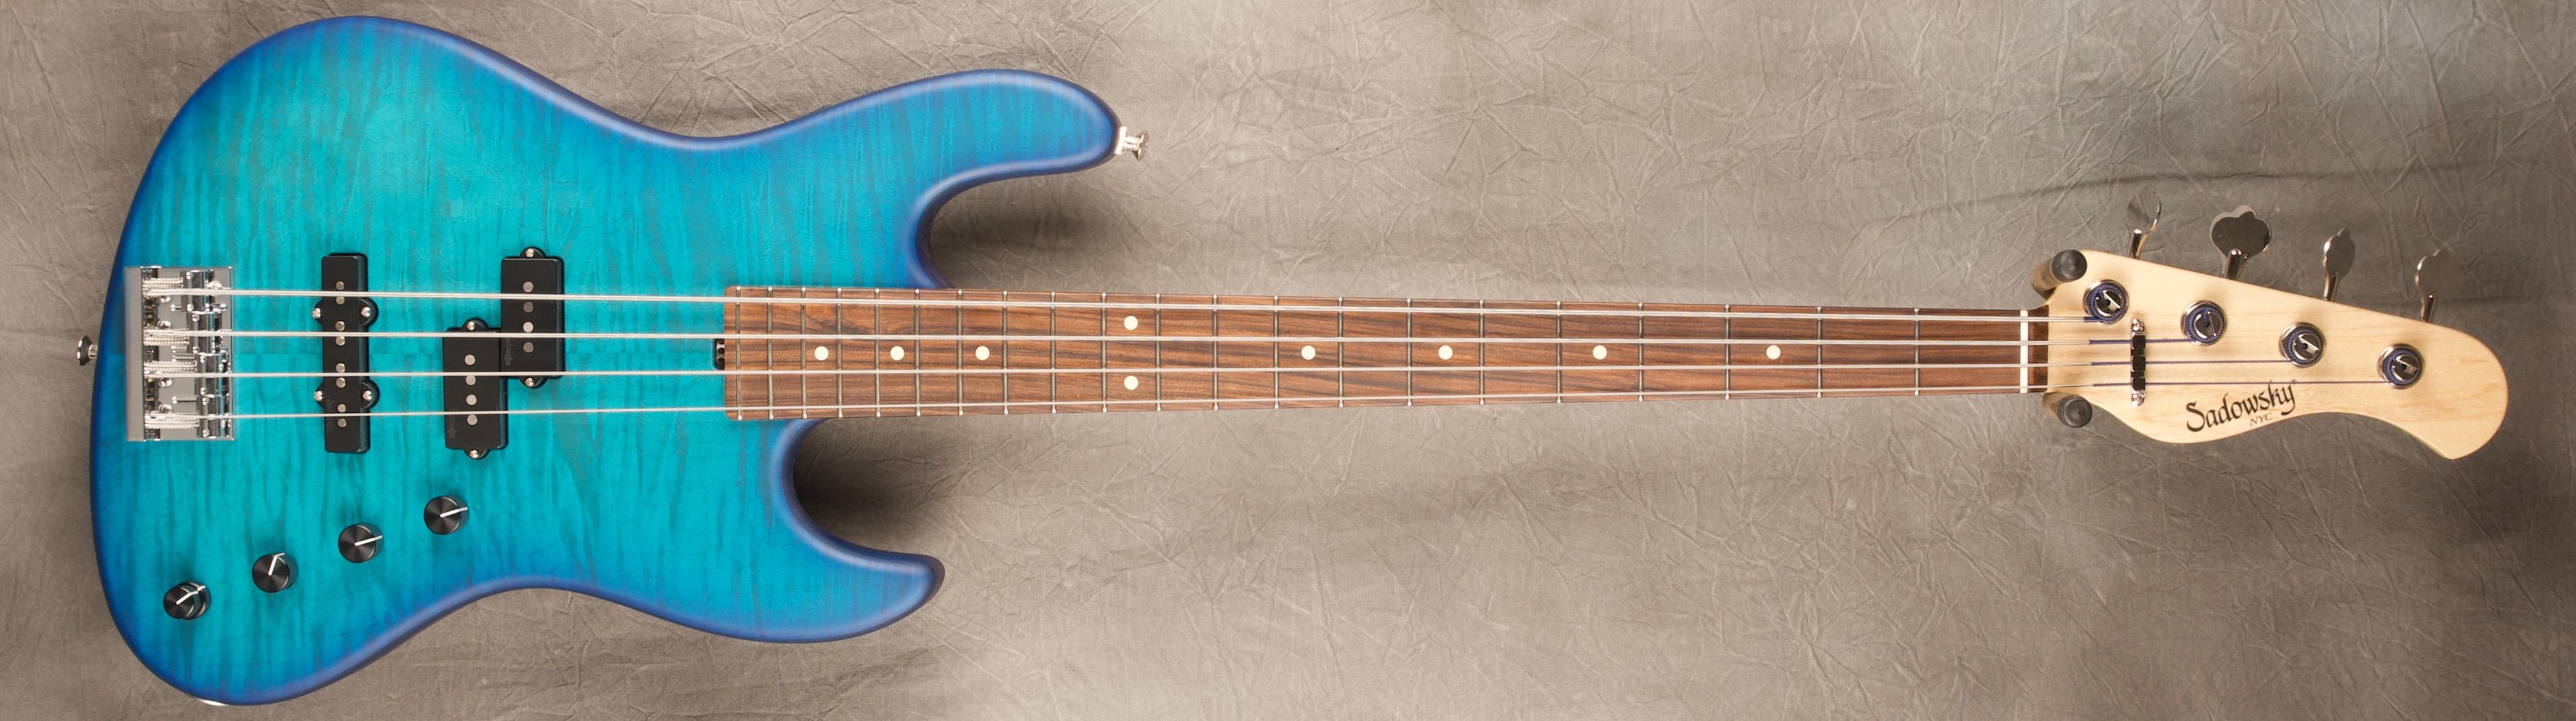 verdine white signature bass sadowsky guitars. Black Bedroom Furniture Sets. Home Design Ideas